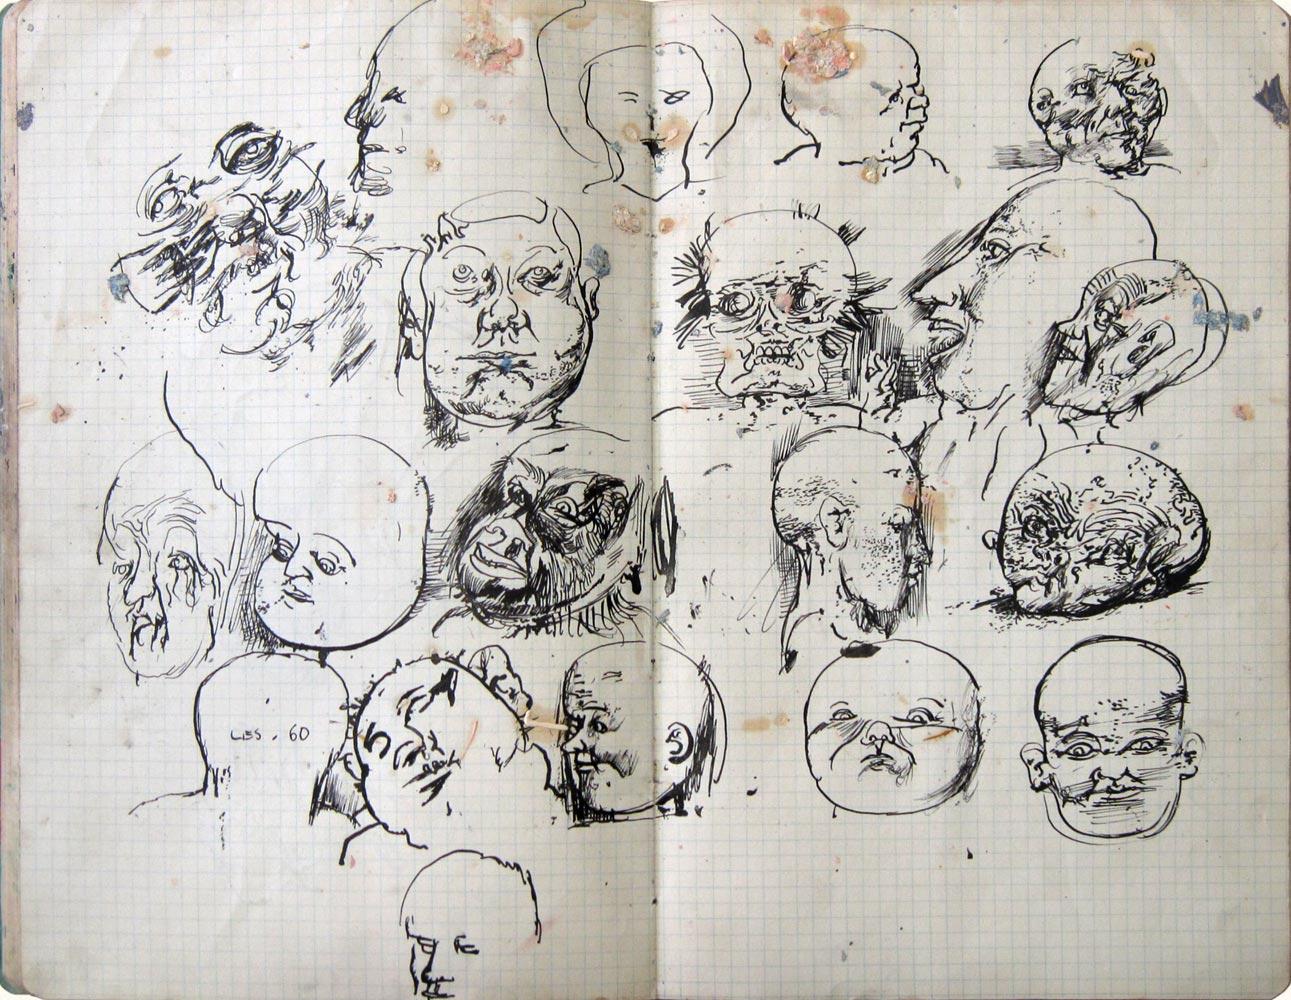 Bilježnica, 1959